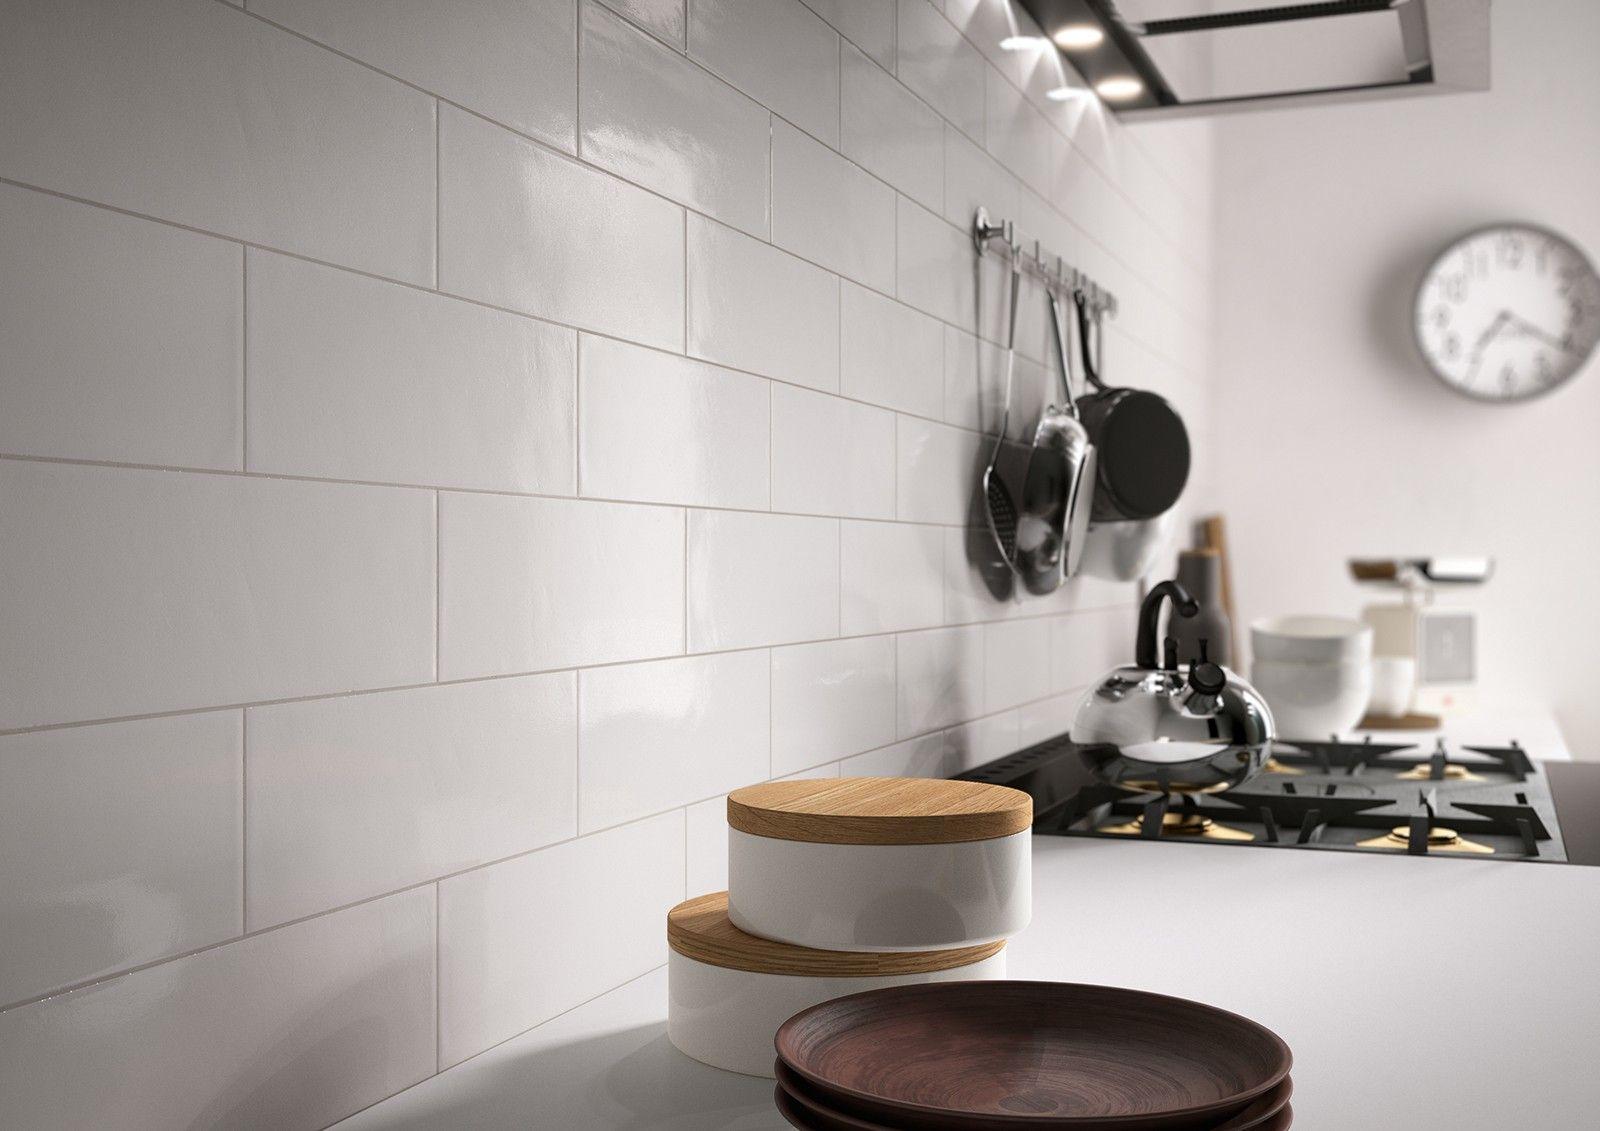 Ragno Brick Glossy White 10x30 Cm R4gj Porcelain Stoneware One Colour 10x30 On Bathroom39 Com At 23 Euro Brick Tiles Bathroom Wall Tile Glazed Walls